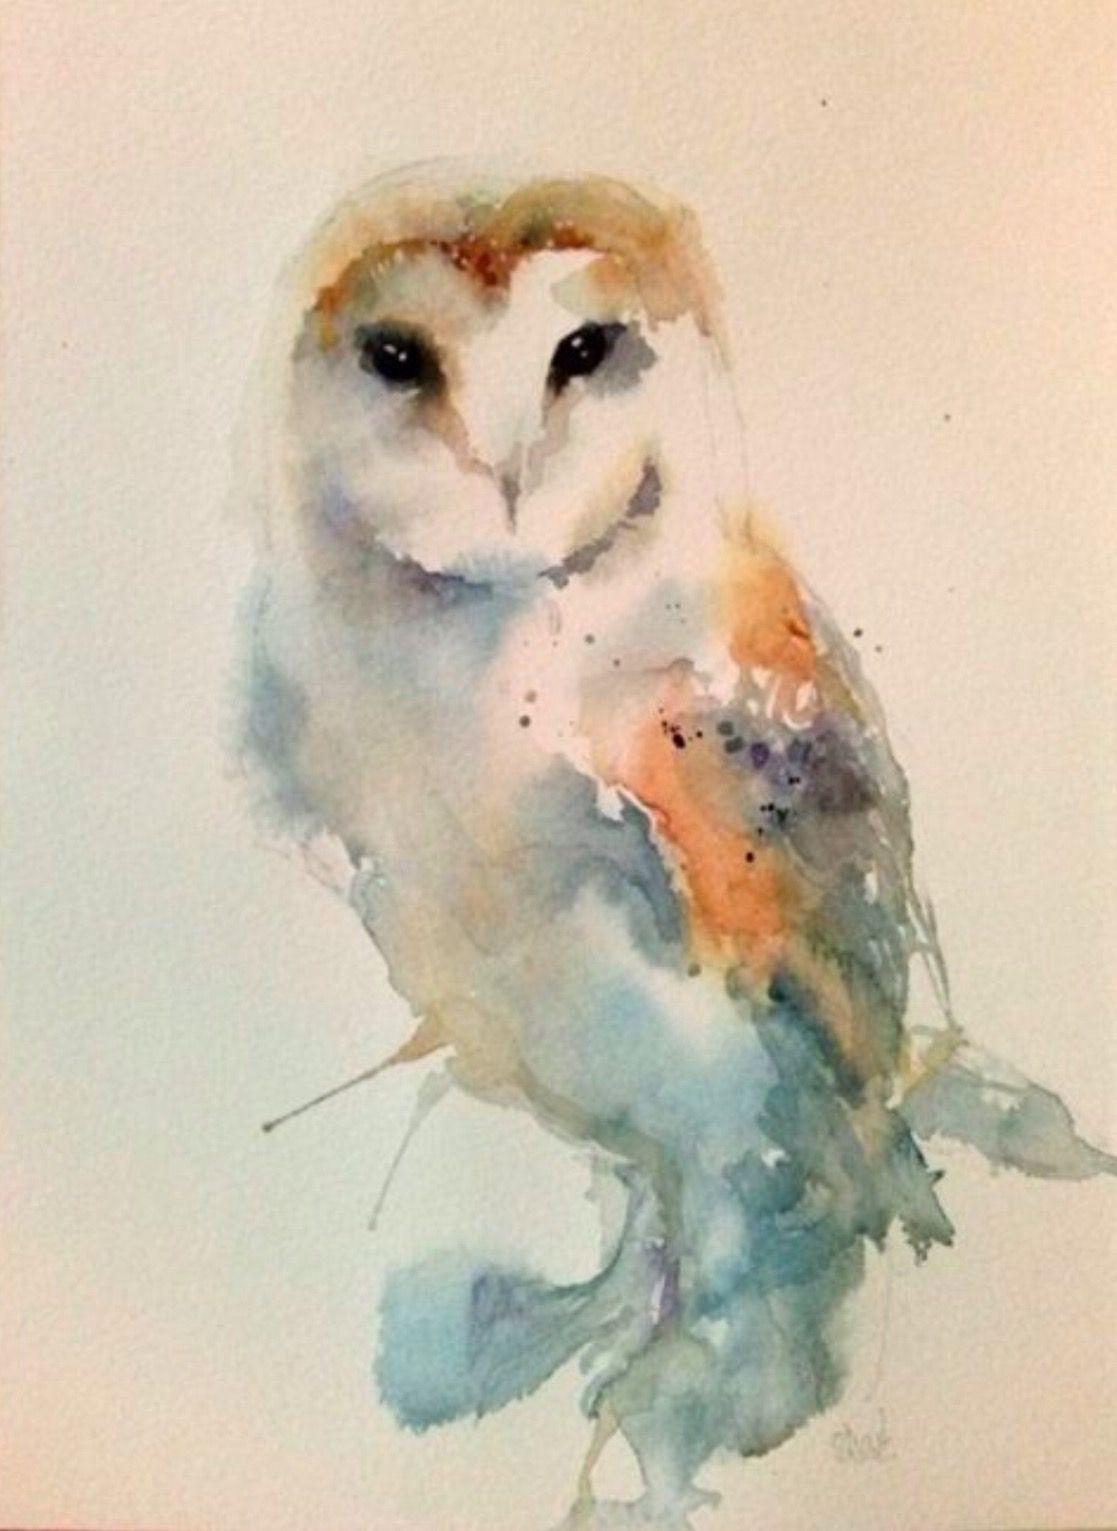 ARTFINDER Barn Owl Watercolour By Inspire Studio Gallery Artist Sarah White